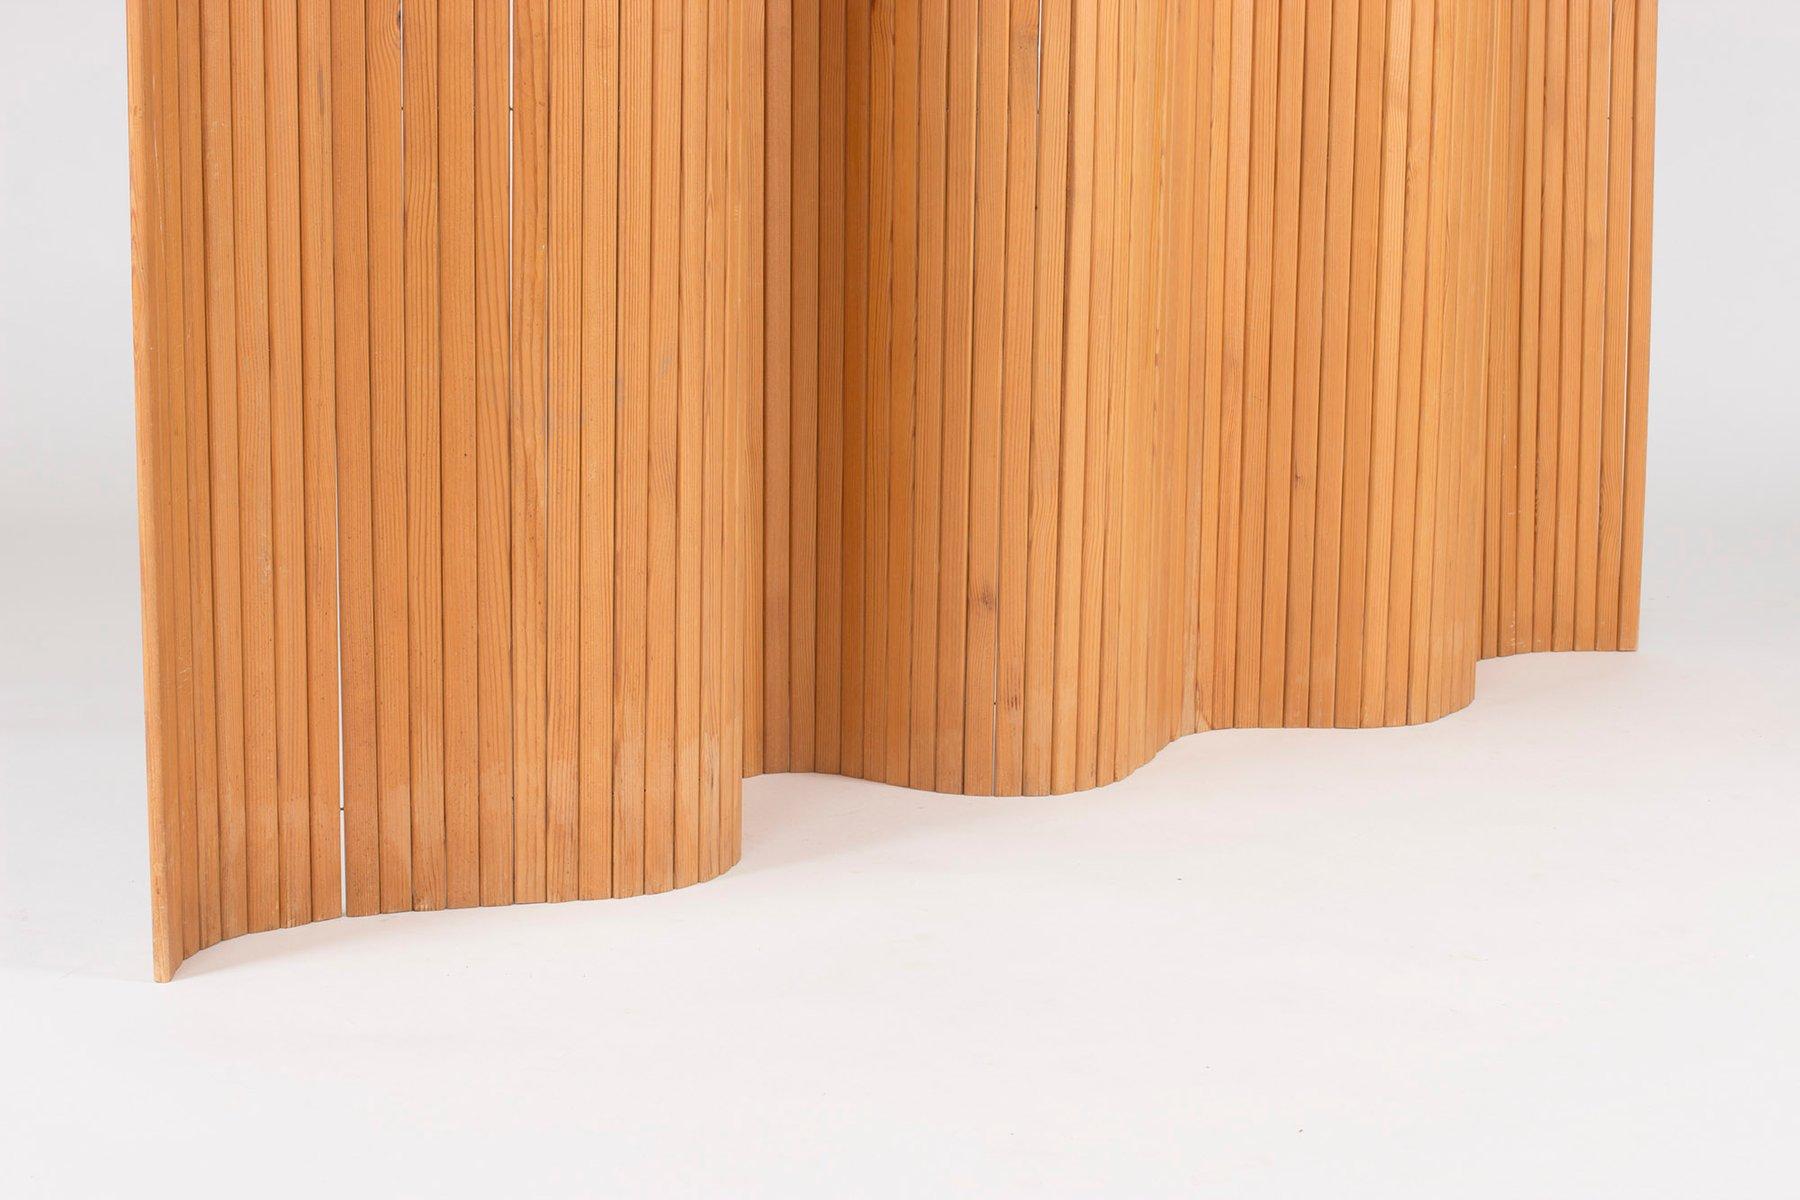 raumteiler aus kiefernholz prinsenvanderaa. Black Bedroom Furniture Sets. Home Design Ideas